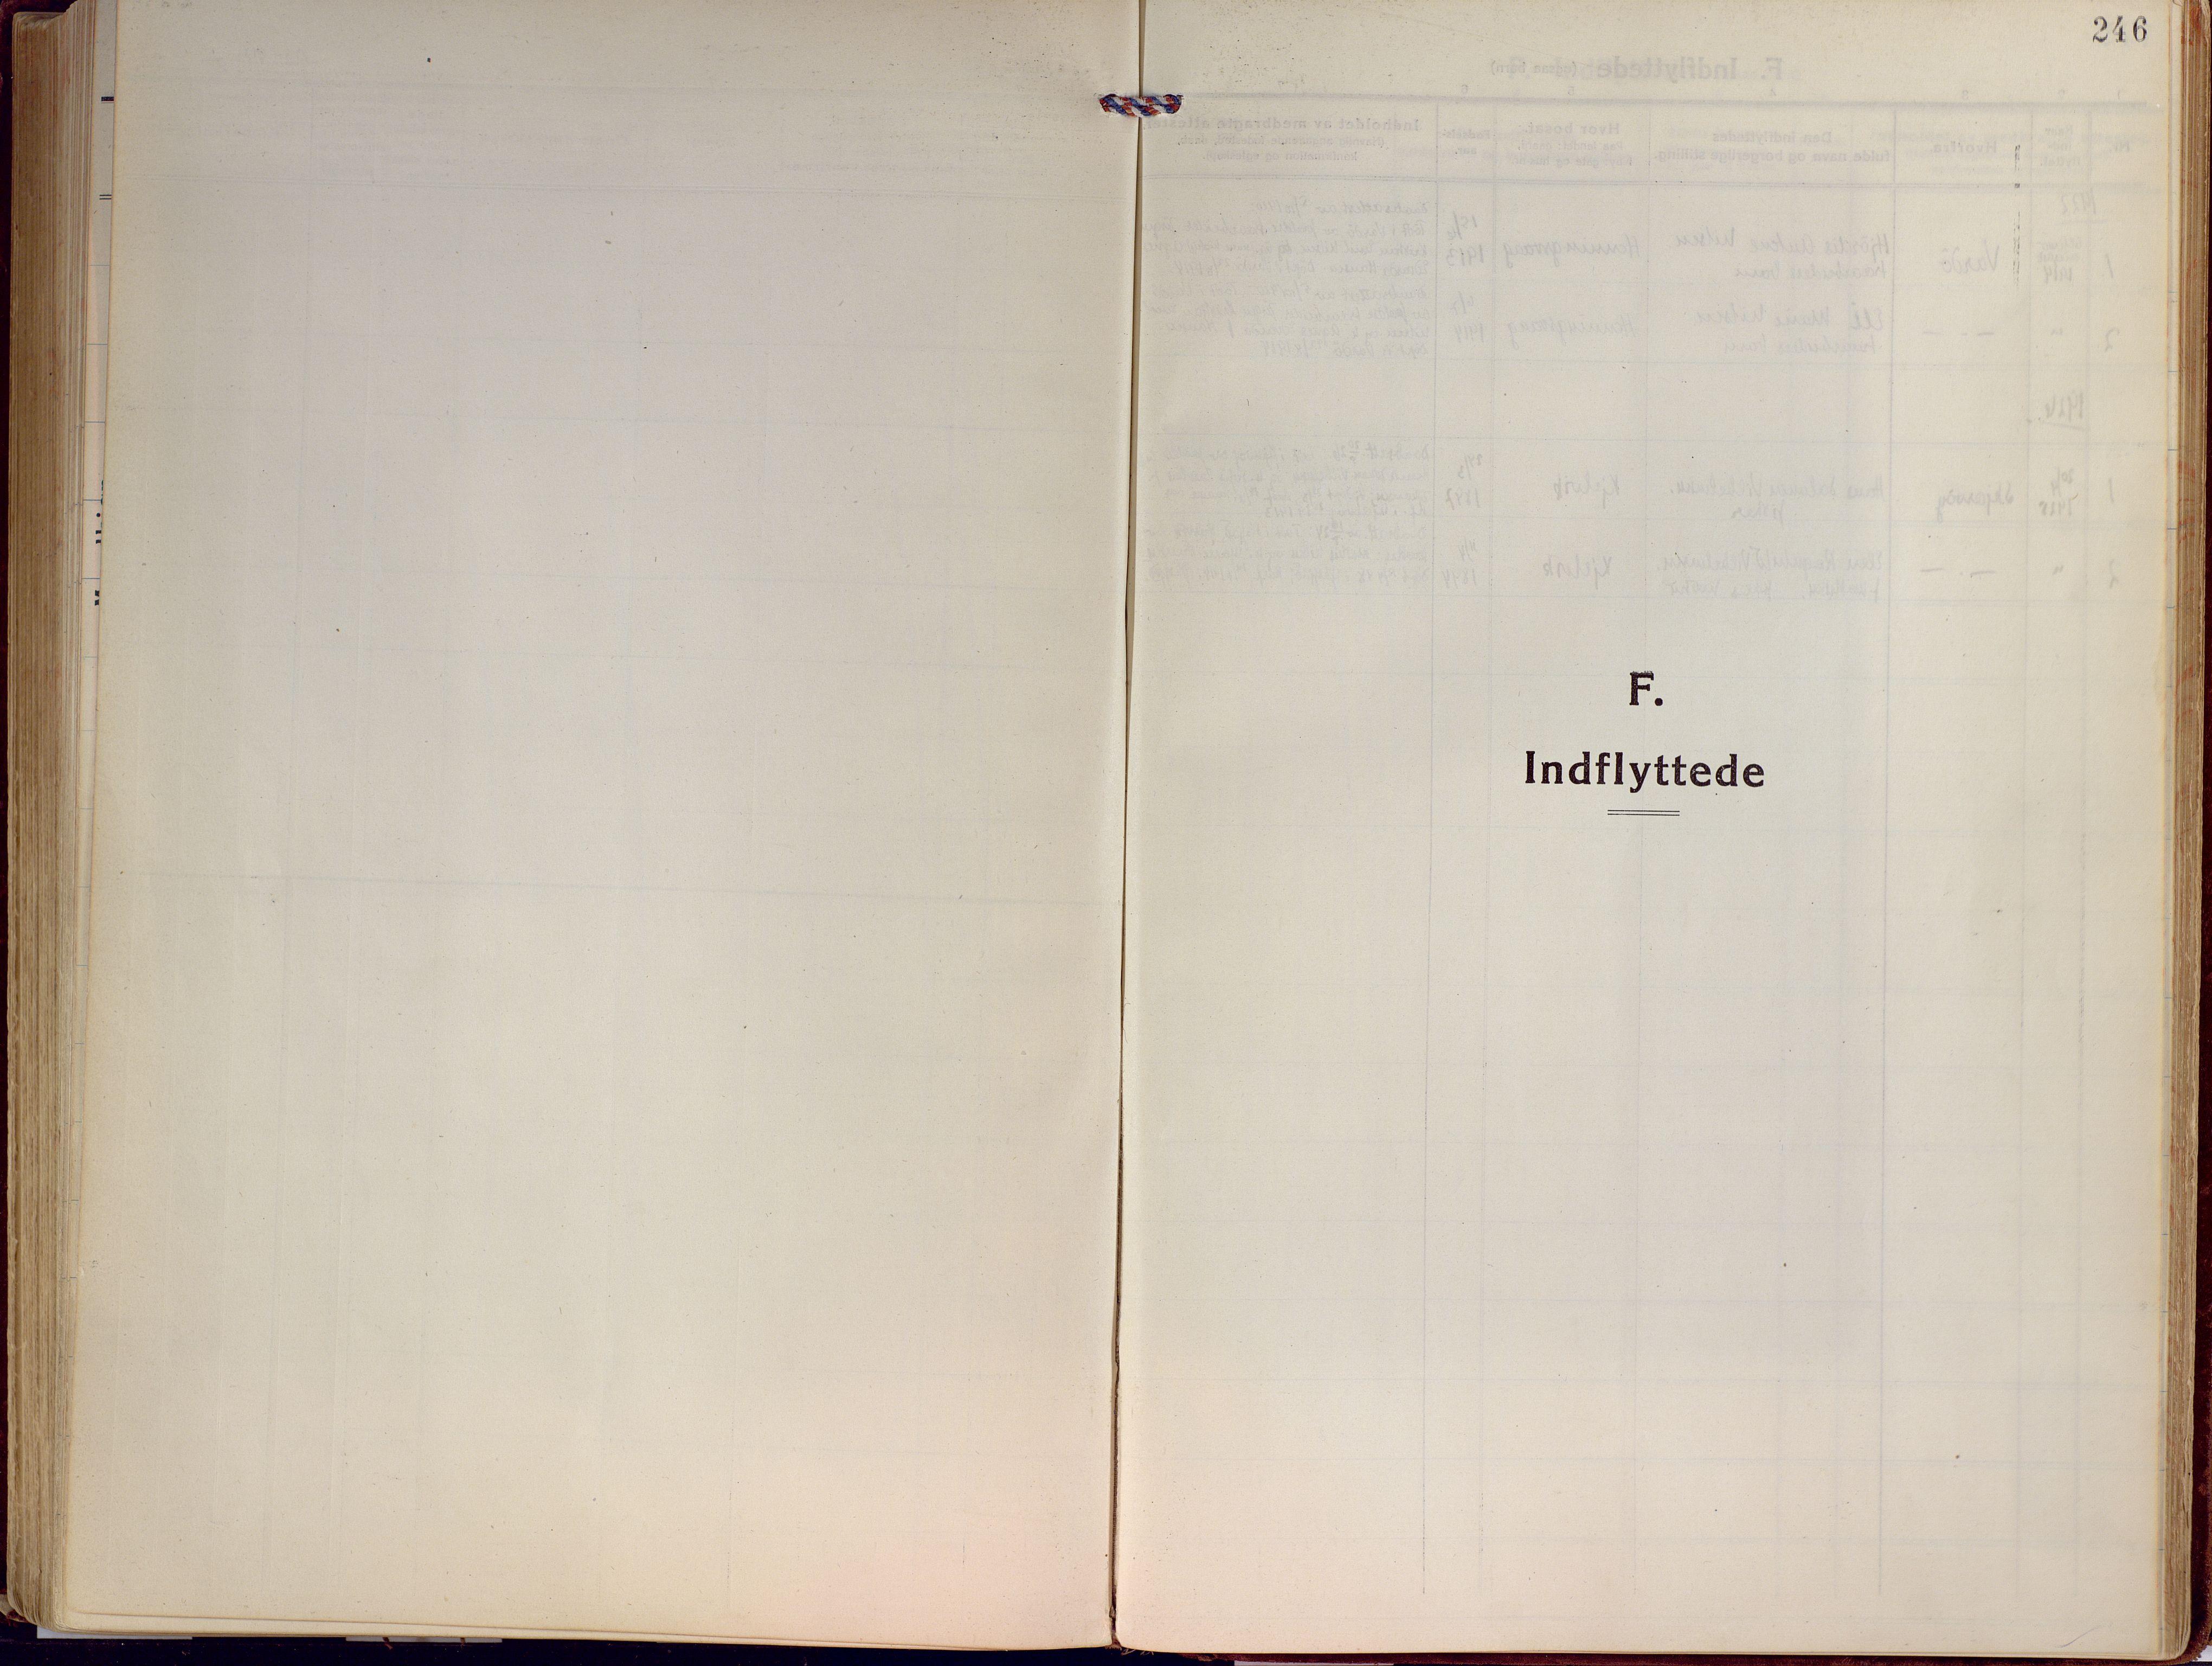 SATØ, Kjelvik/Nordkapp sokneprestkontor, H/Ha/L0002kirke: Ministerialbok nr. 2, 1920-1929, s. 246